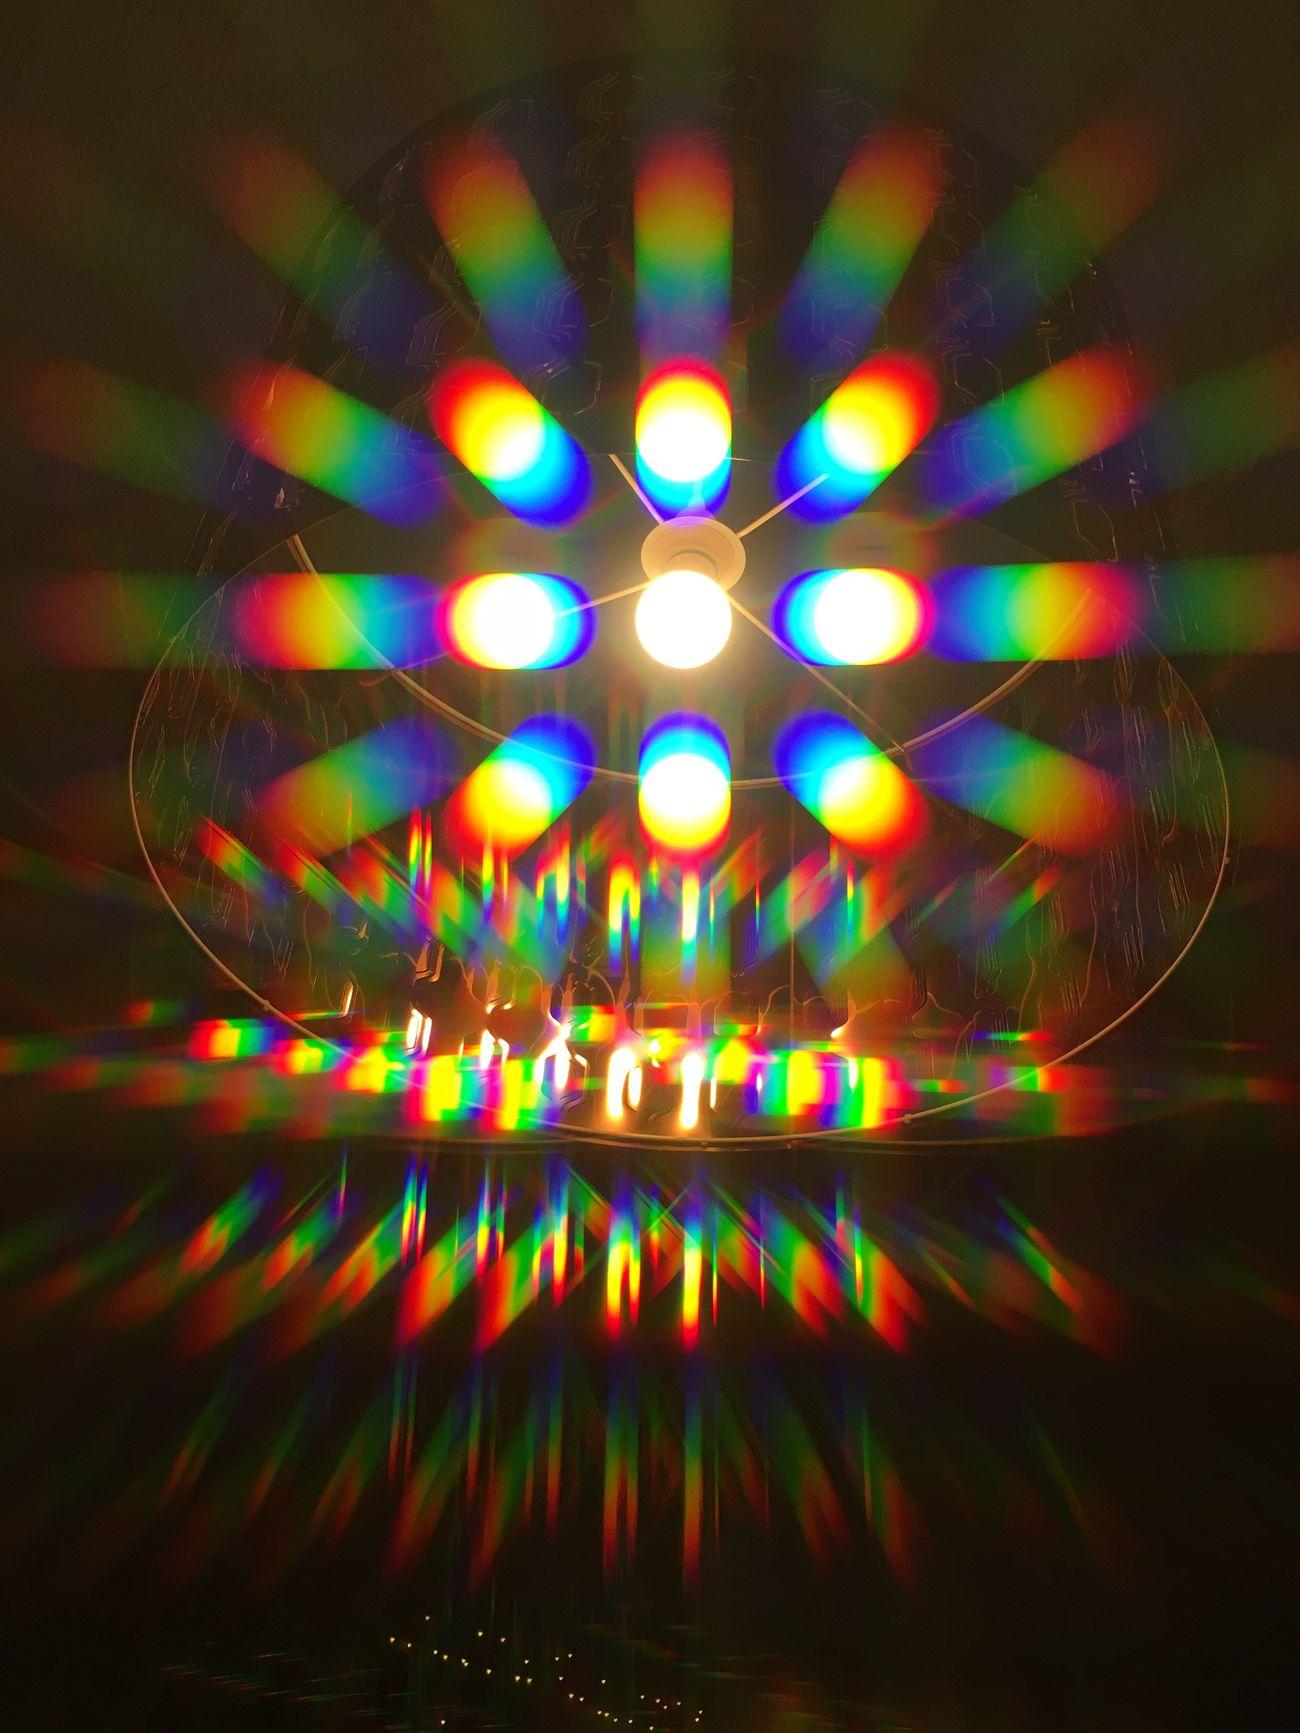 Multi Colored Illuminated Lighting Equipment Reflection Light Effect Night Indoors  Rainbow Prism Refraction Trippy